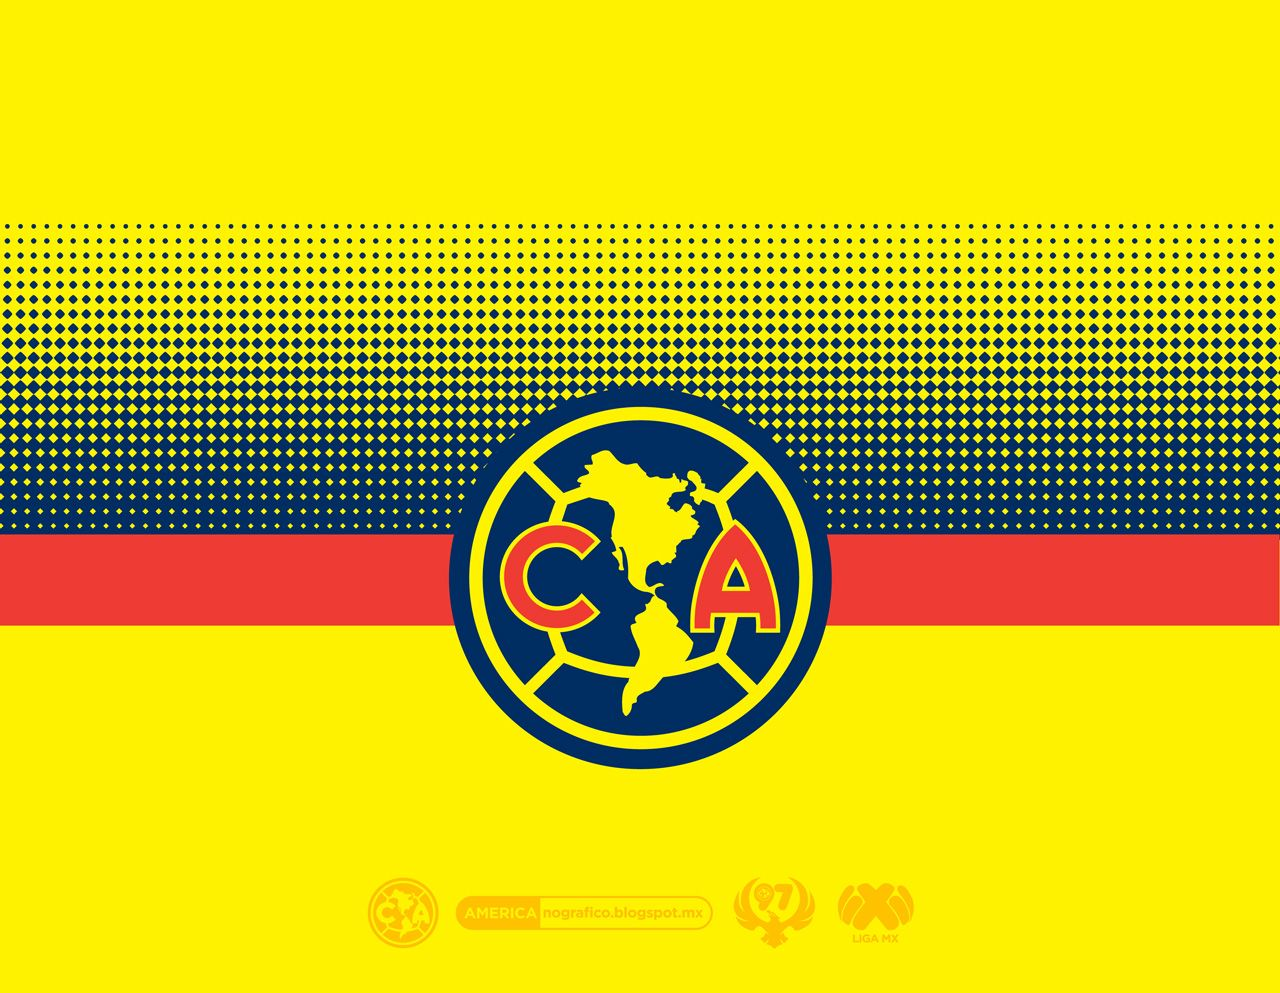 Club América Wallpaper • #AMERICAnografico   América   Club america, America, Club